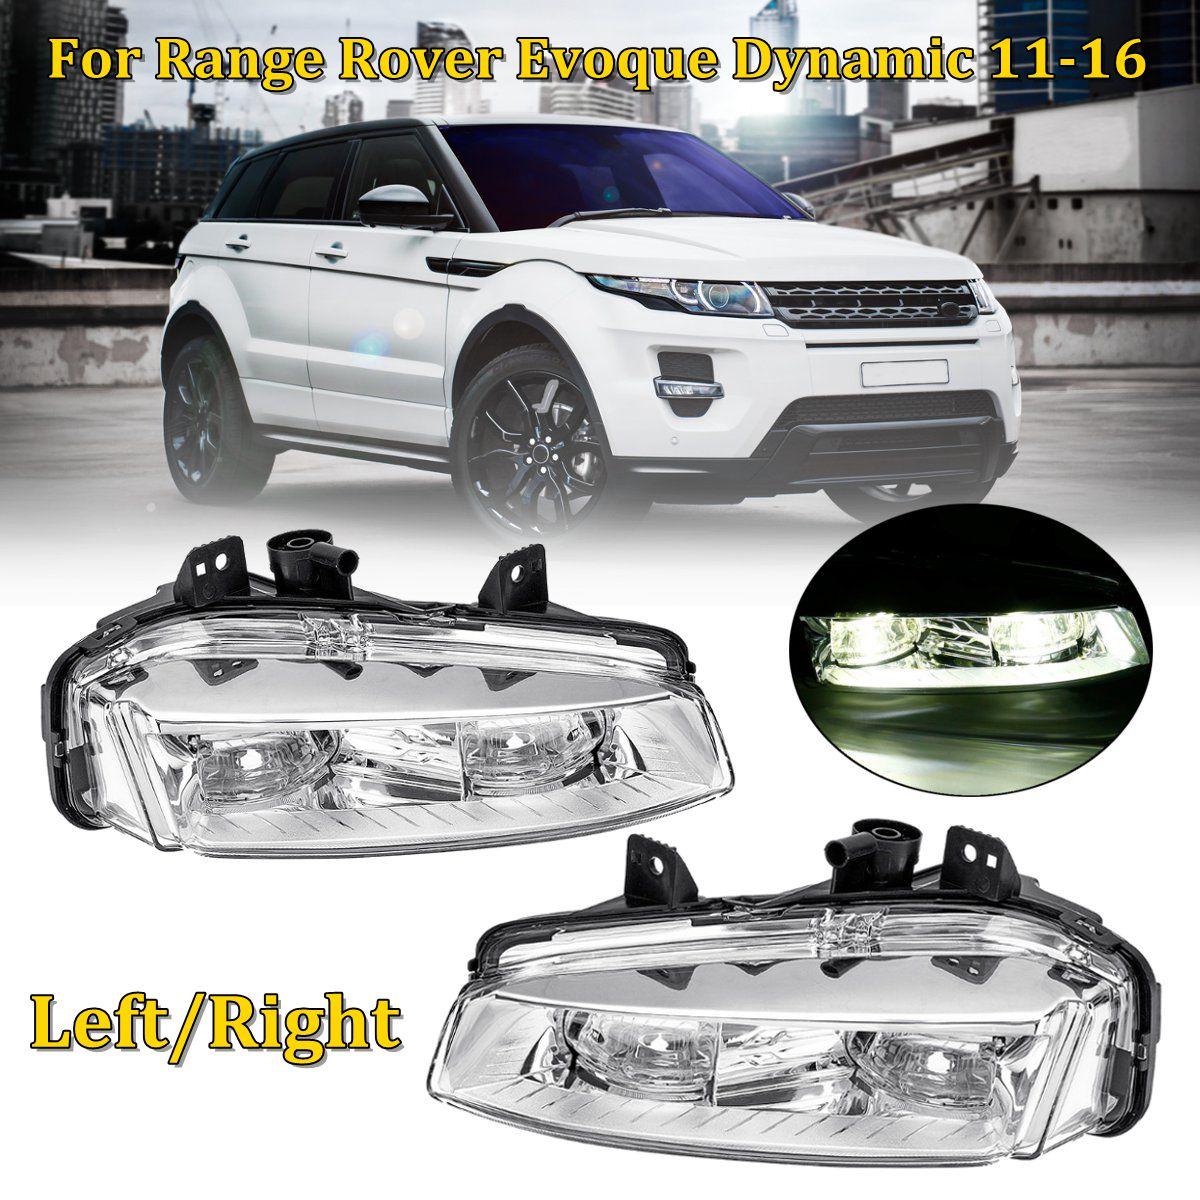 12V Left/Right Car Front Bumper Fog Lights Lamp Replacement For Range Rover Evoque Dynamic 2011 2012 2013 2014 2015 201612V Left/Right Car Front Bumper Fog Lights Lamp Replacement For Range Rover Evoque Dynamic 2011 2012 2013 2014 2015 2016